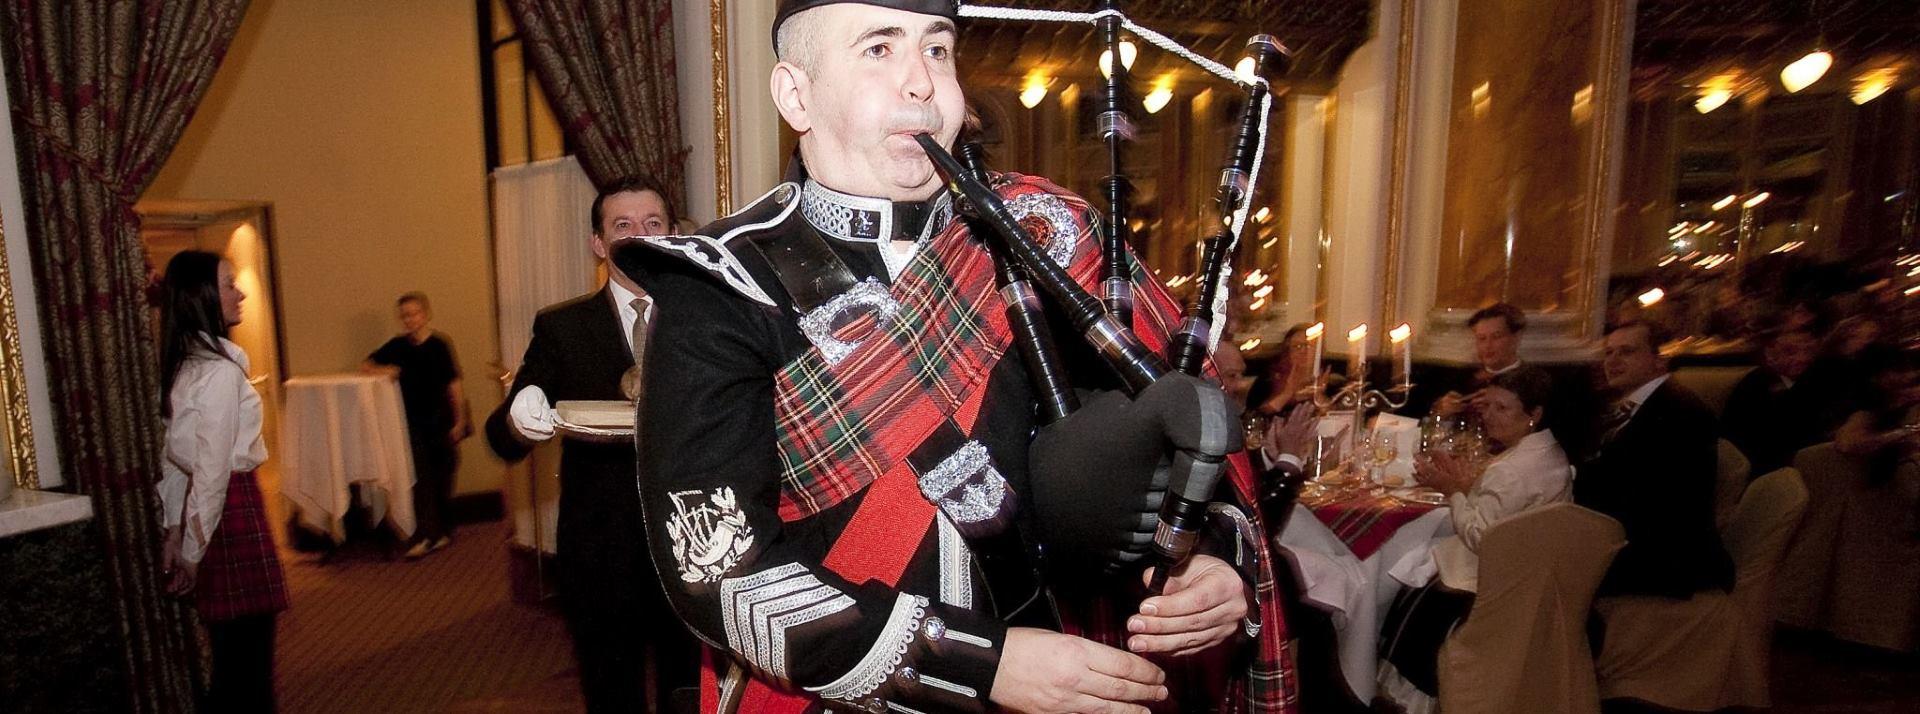 THE FAMOUS BURNS NIGHT Gala svečanost u čast škotskom bardu (28. siječnja)